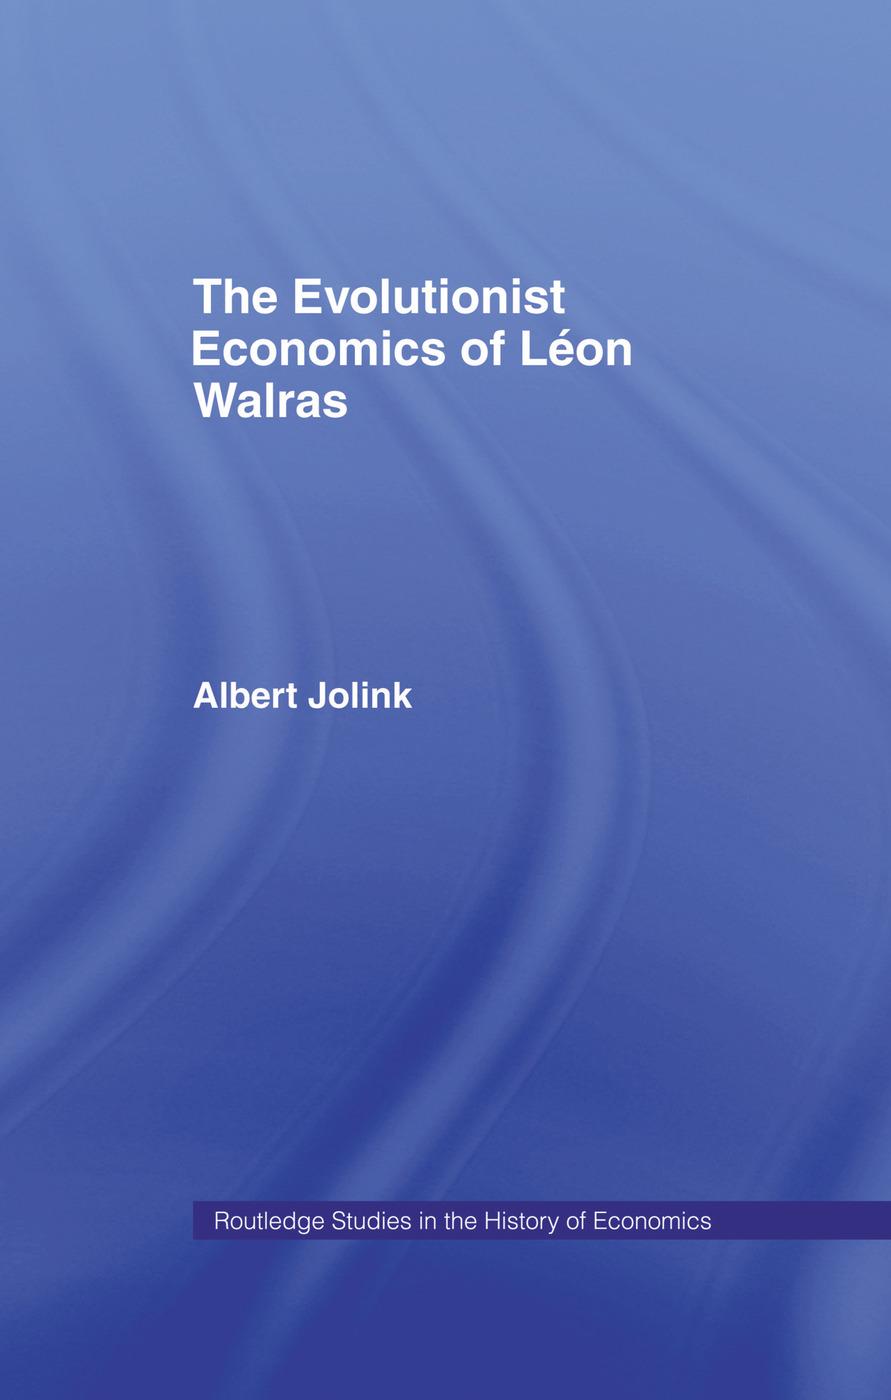 The Evolutionist Economics of Leon Walras